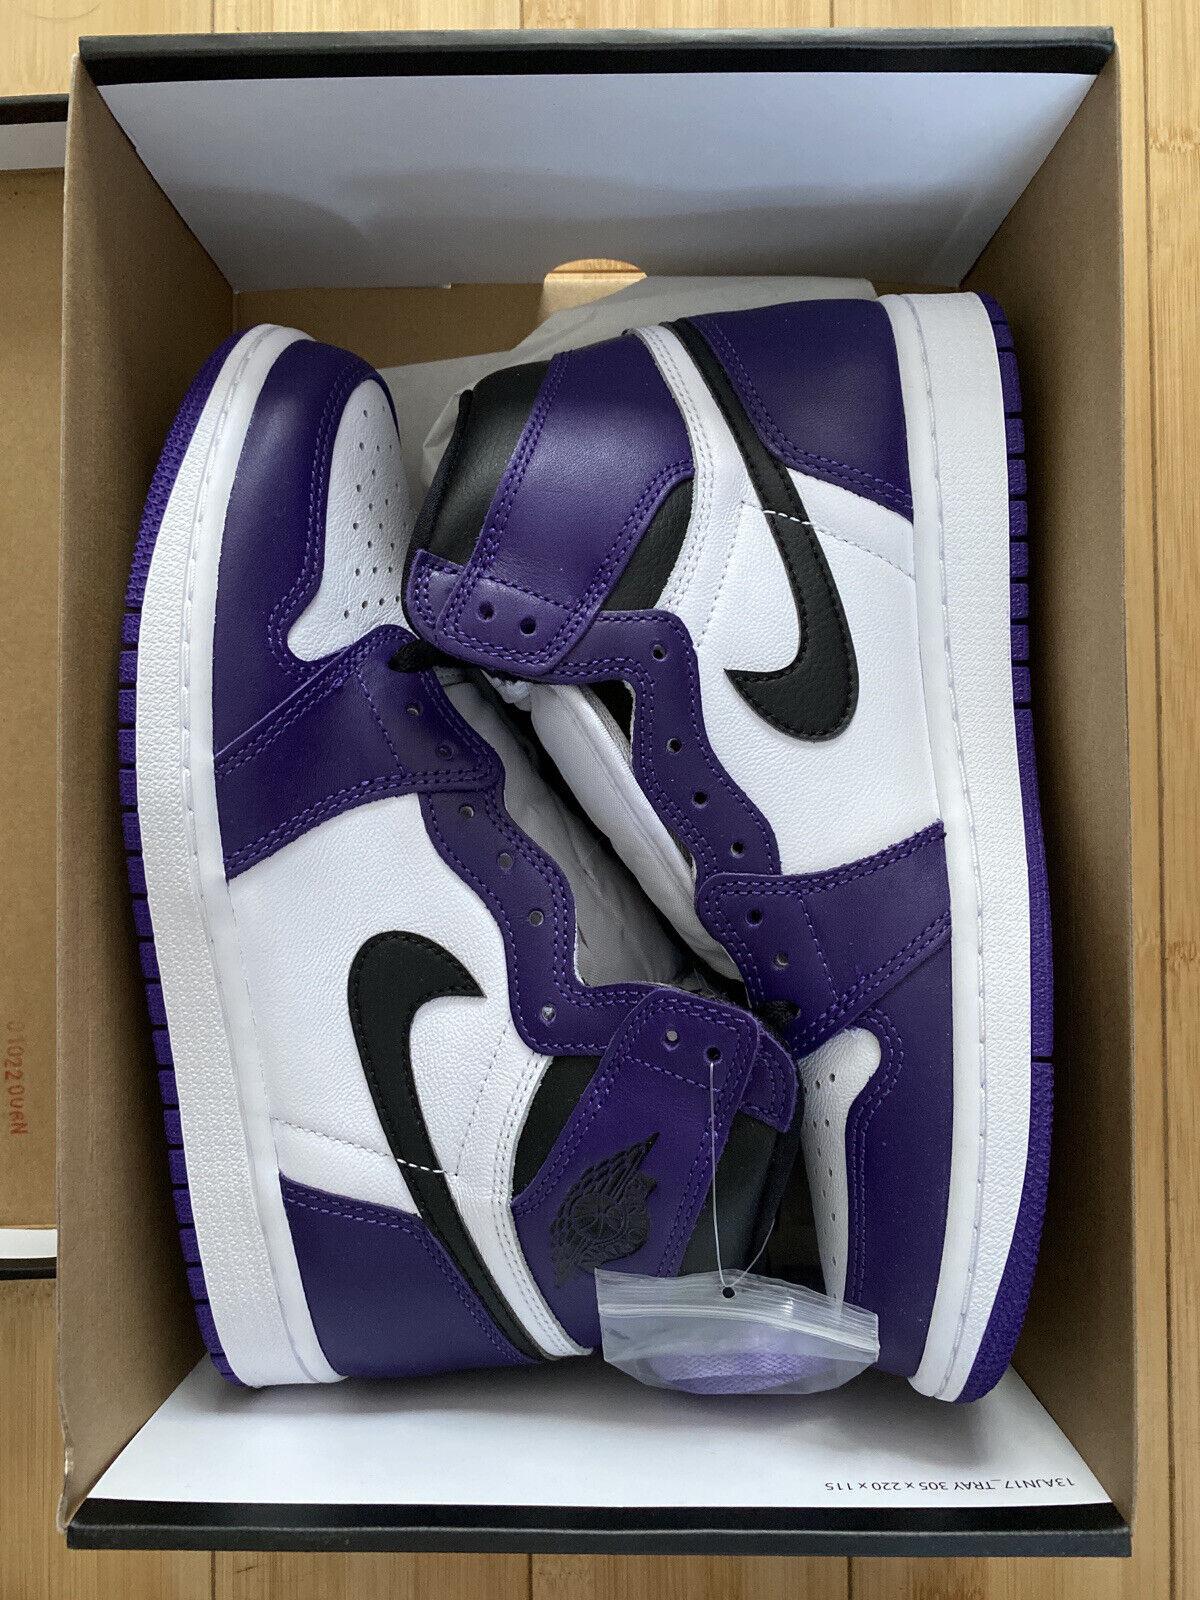 Jordan 1 Retro High Court Purple White - Size UK 6.5 US 7.5